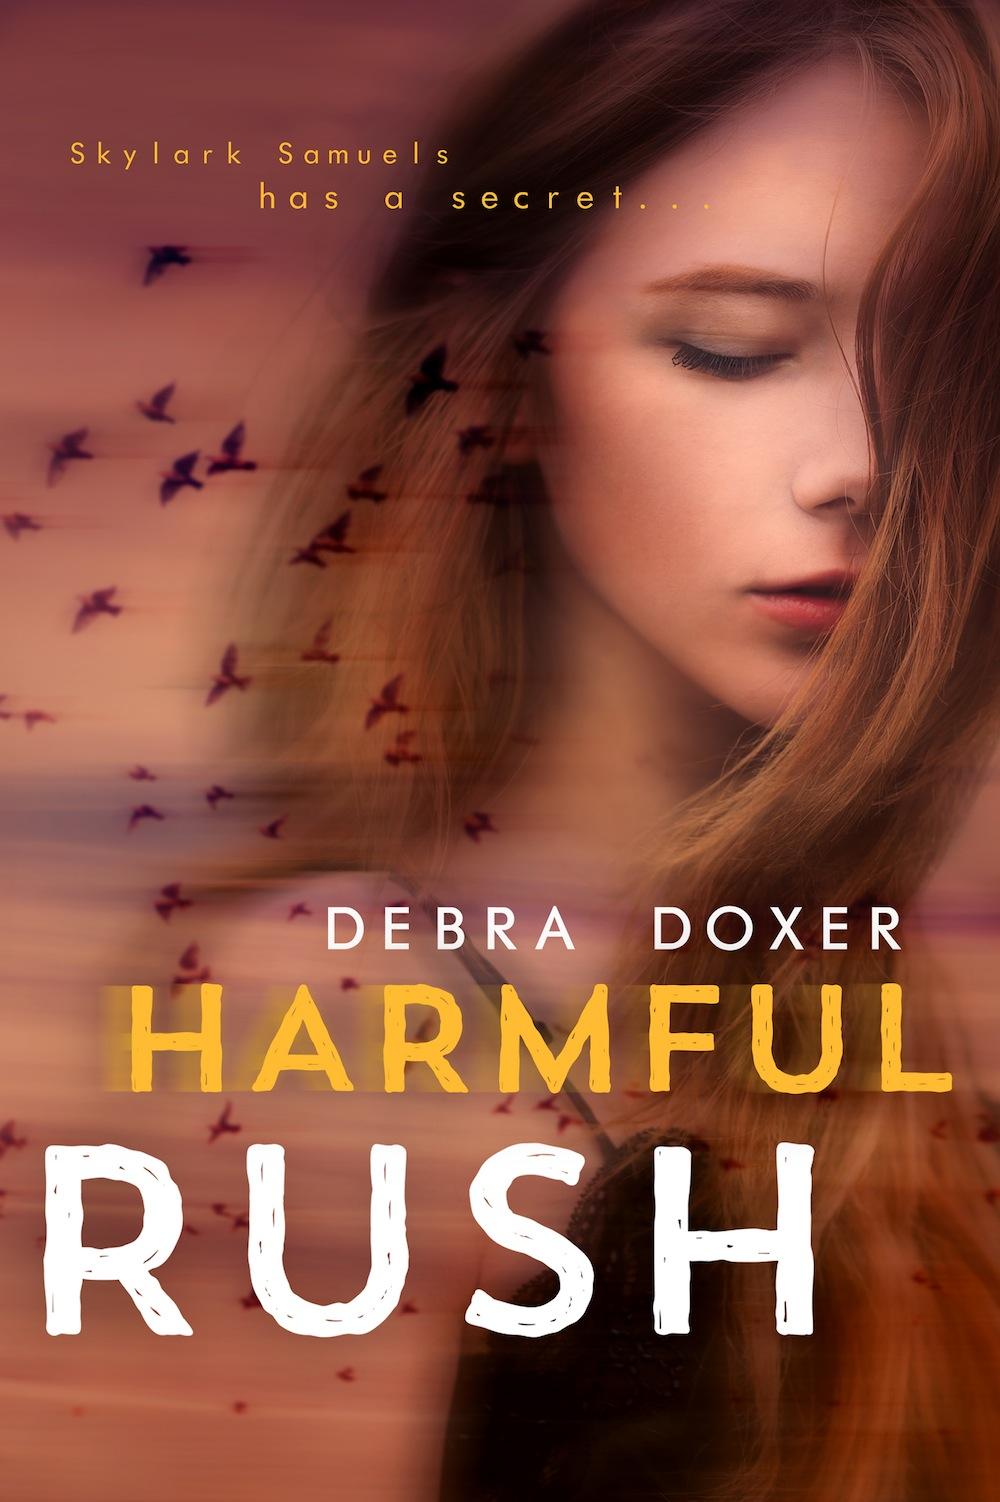 Harmful Rush